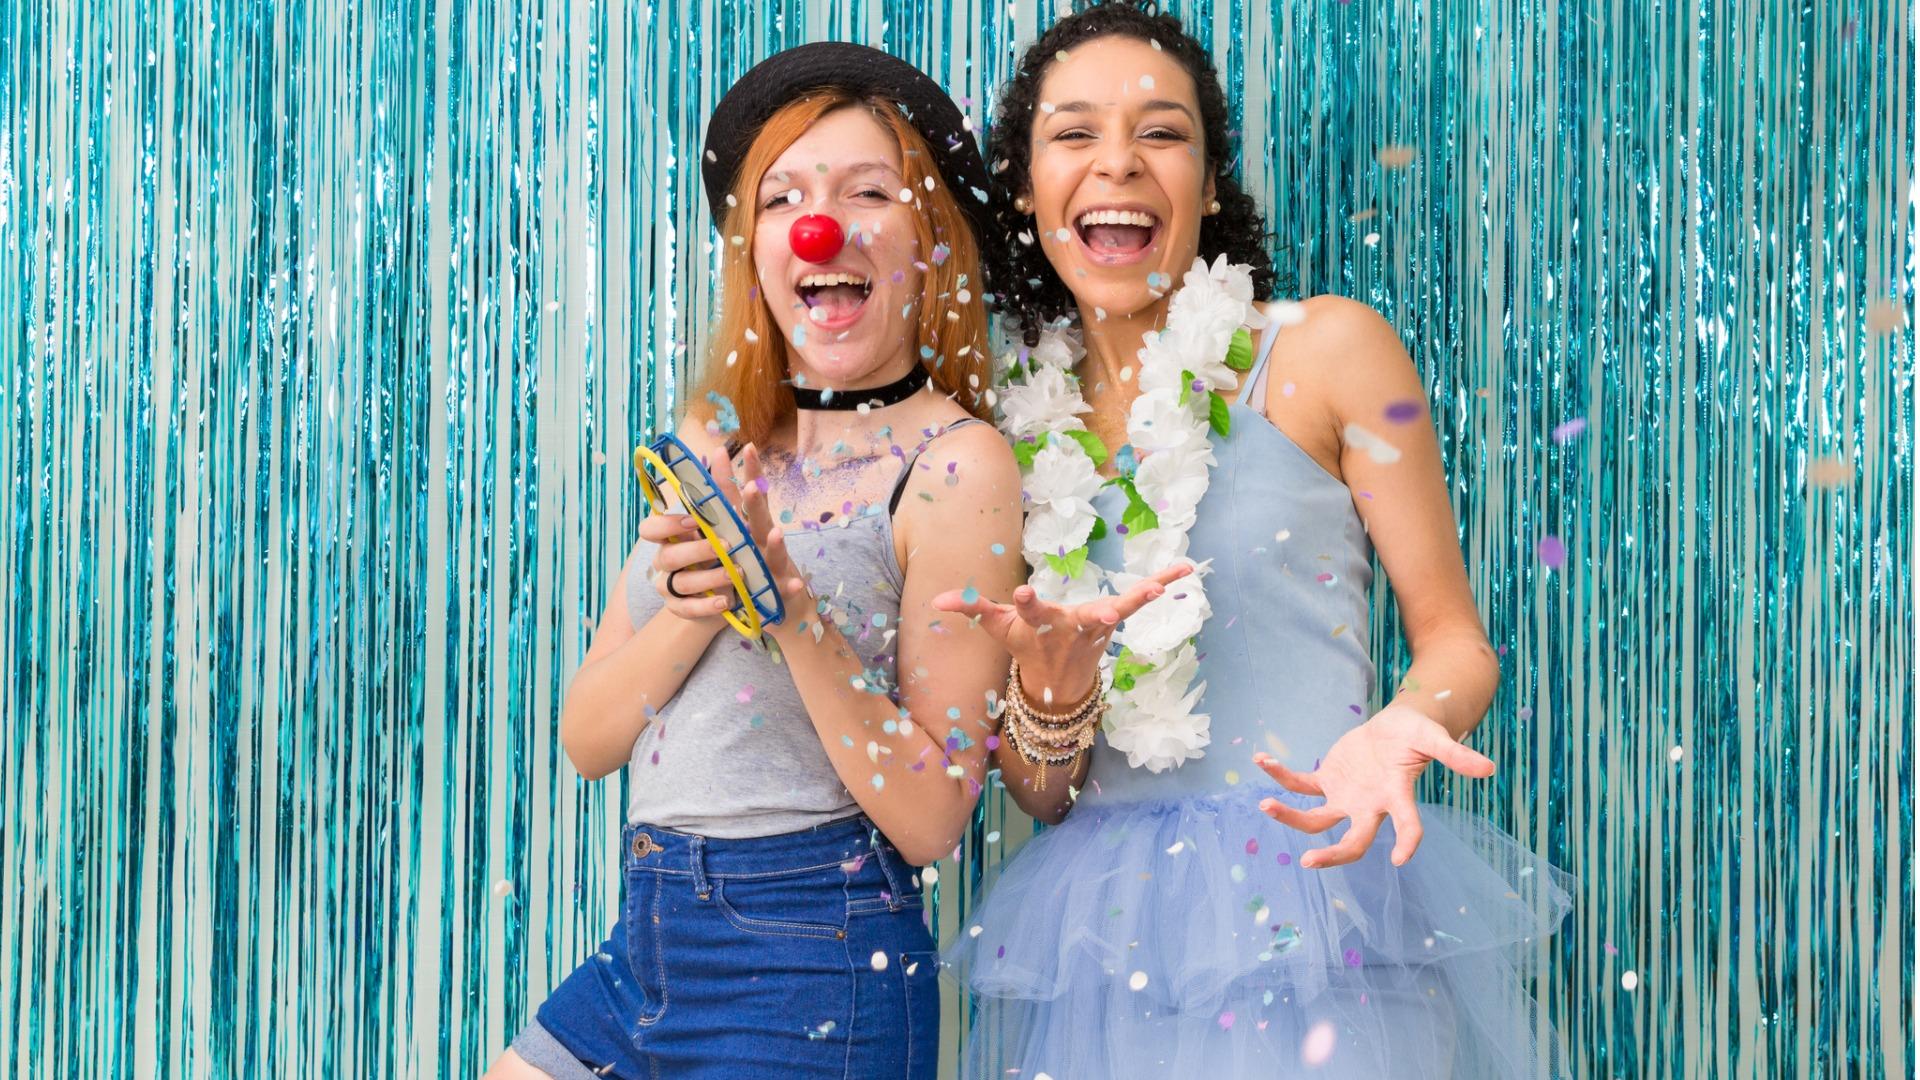 two-friends-are-celebrating-carnaval-blue-color-predominant-confettin-picture-id901980716